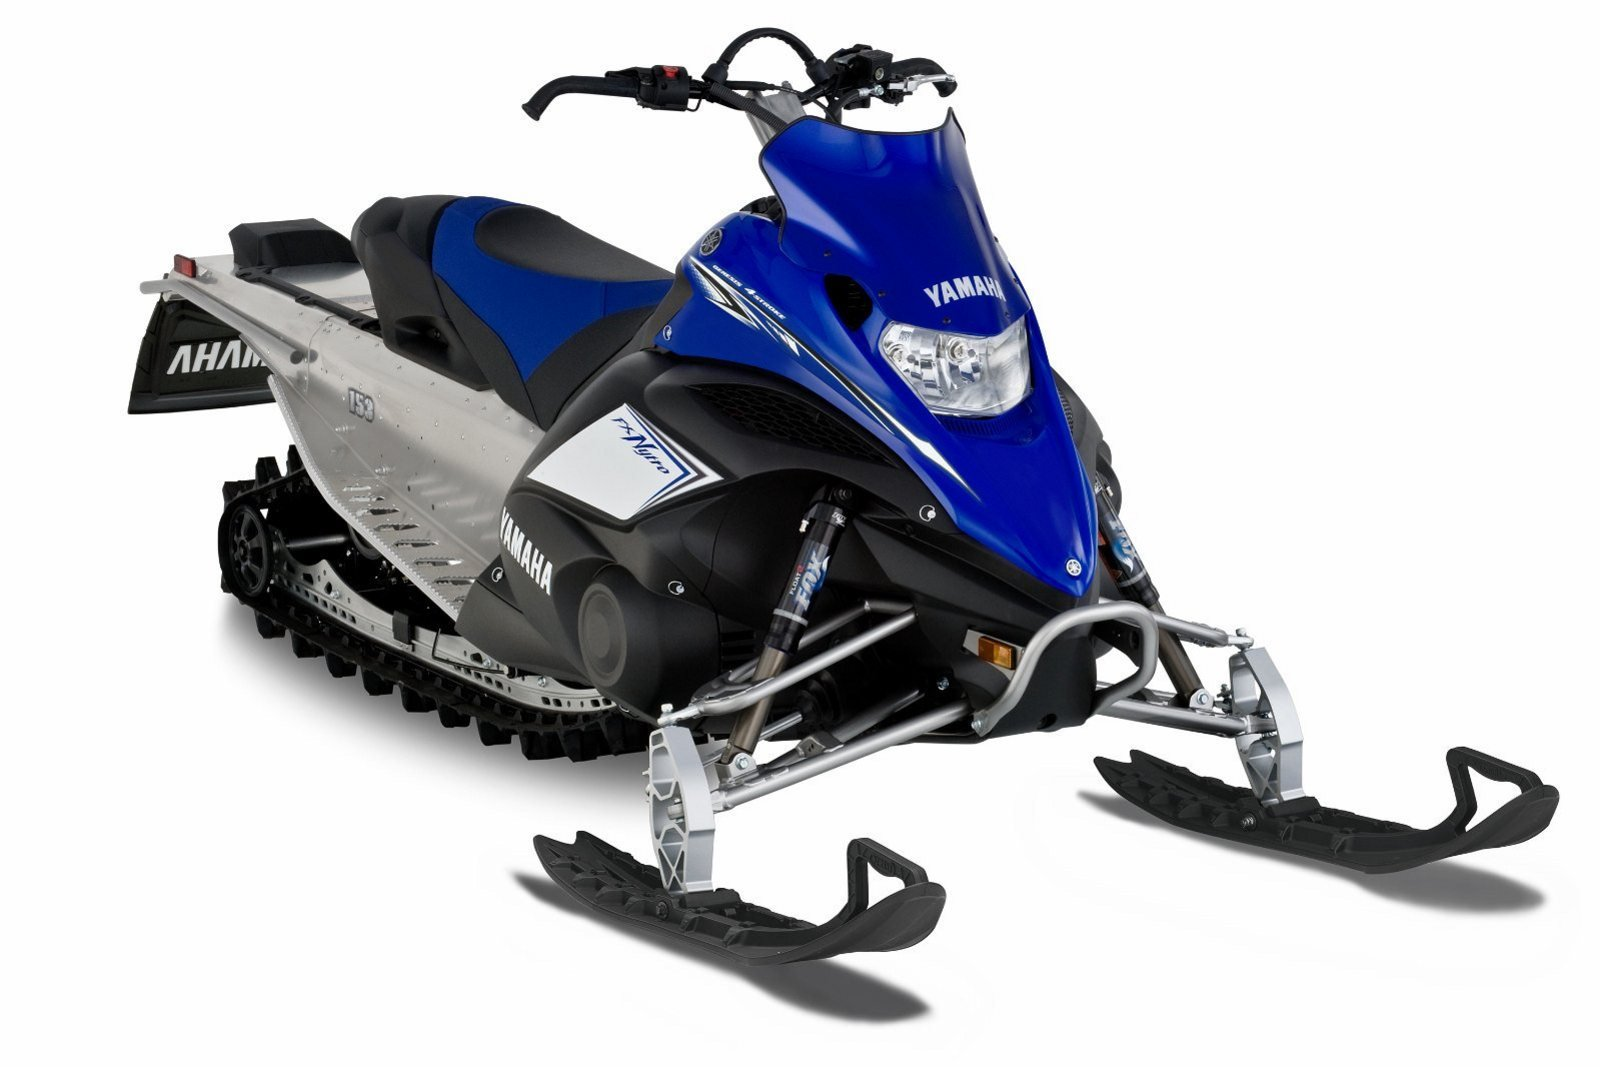 Yamaha Fx Nytro Mtx 153 Review